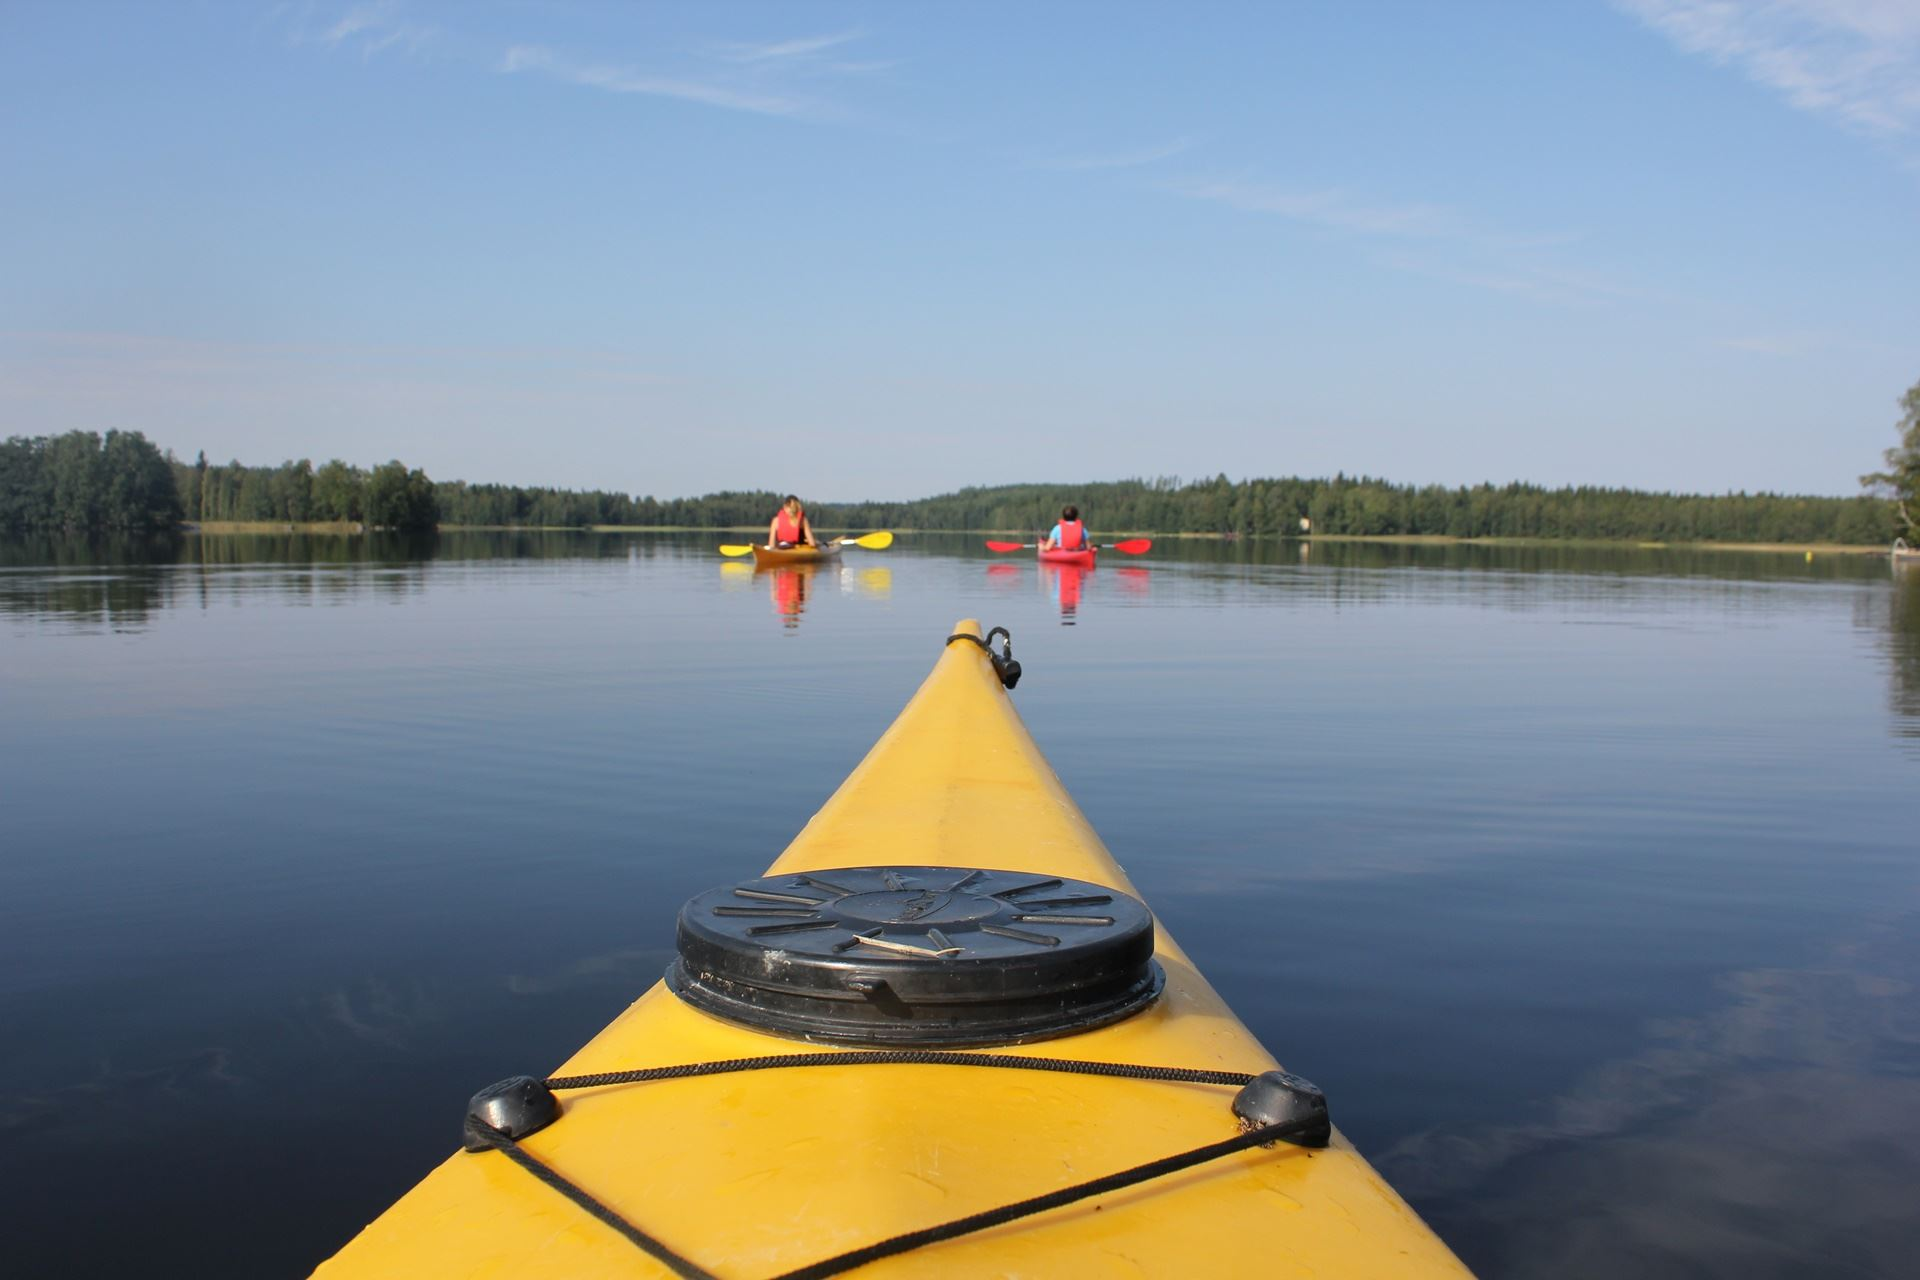 Secrets of the Lake kayaking trip | Best Lake Nature Adventures